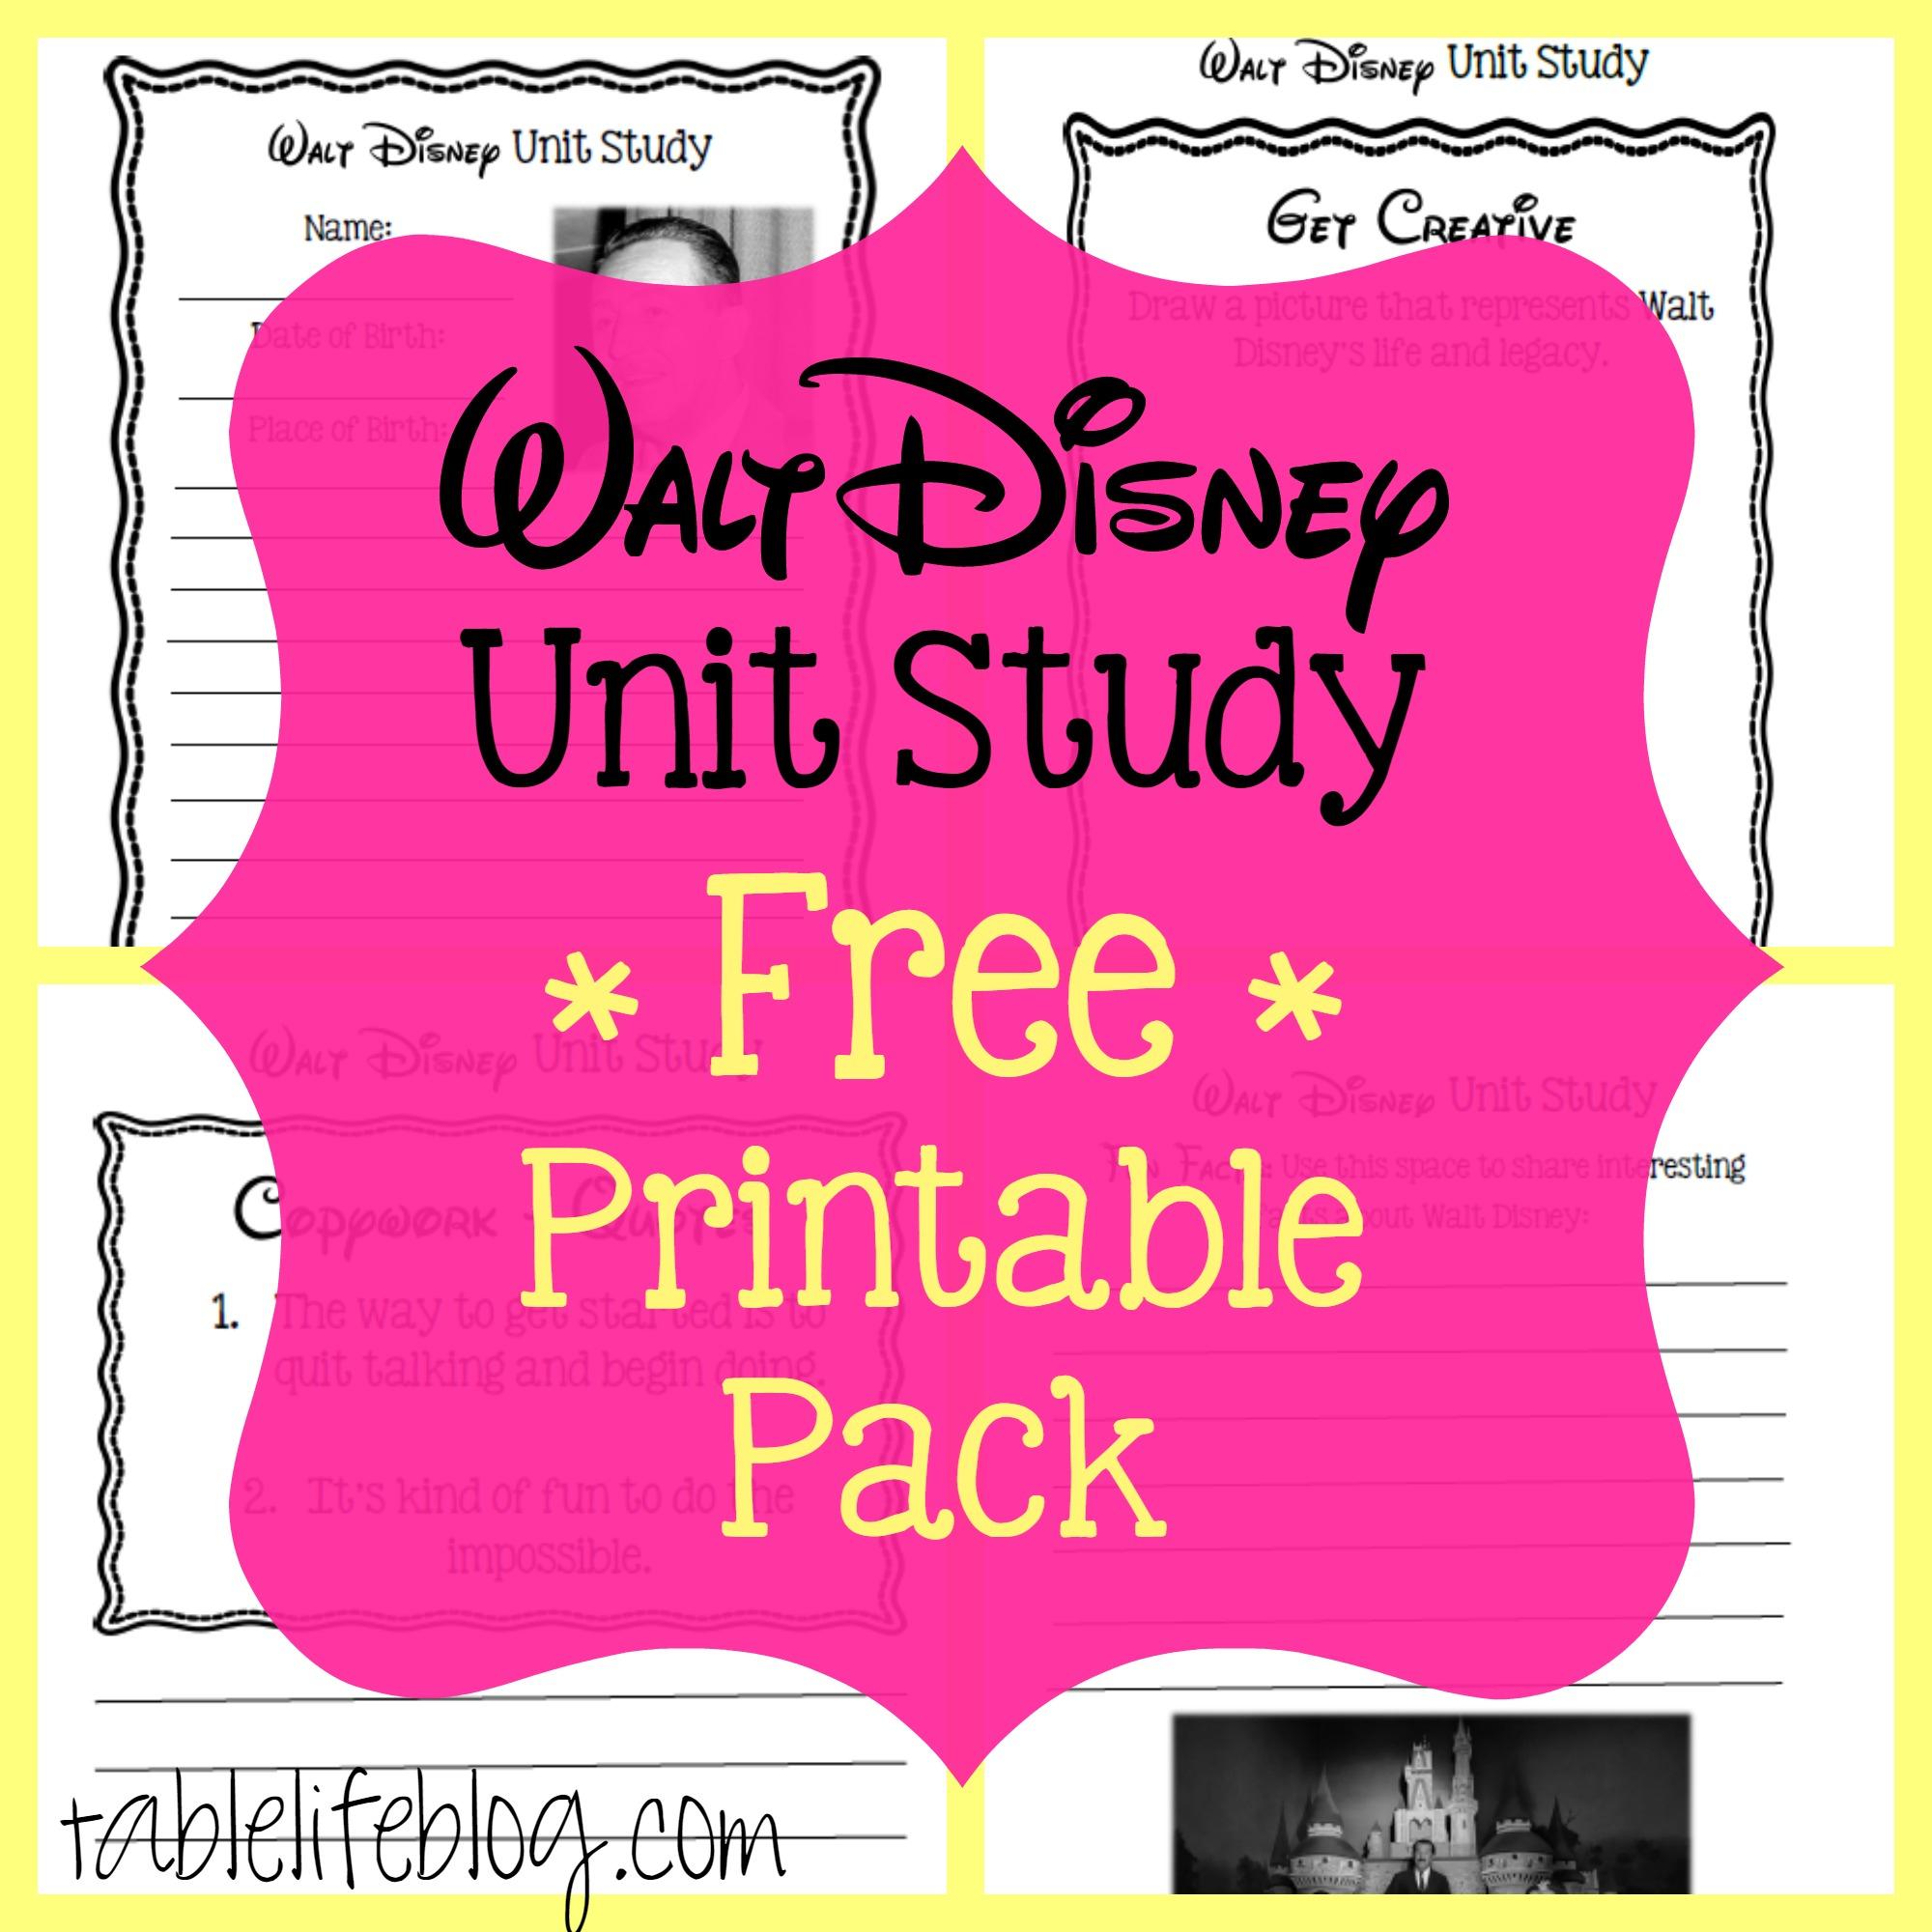 Walt Disney Unit Study (With Free Printable!) - Tablelifeblog - Free Printable Disney Stories